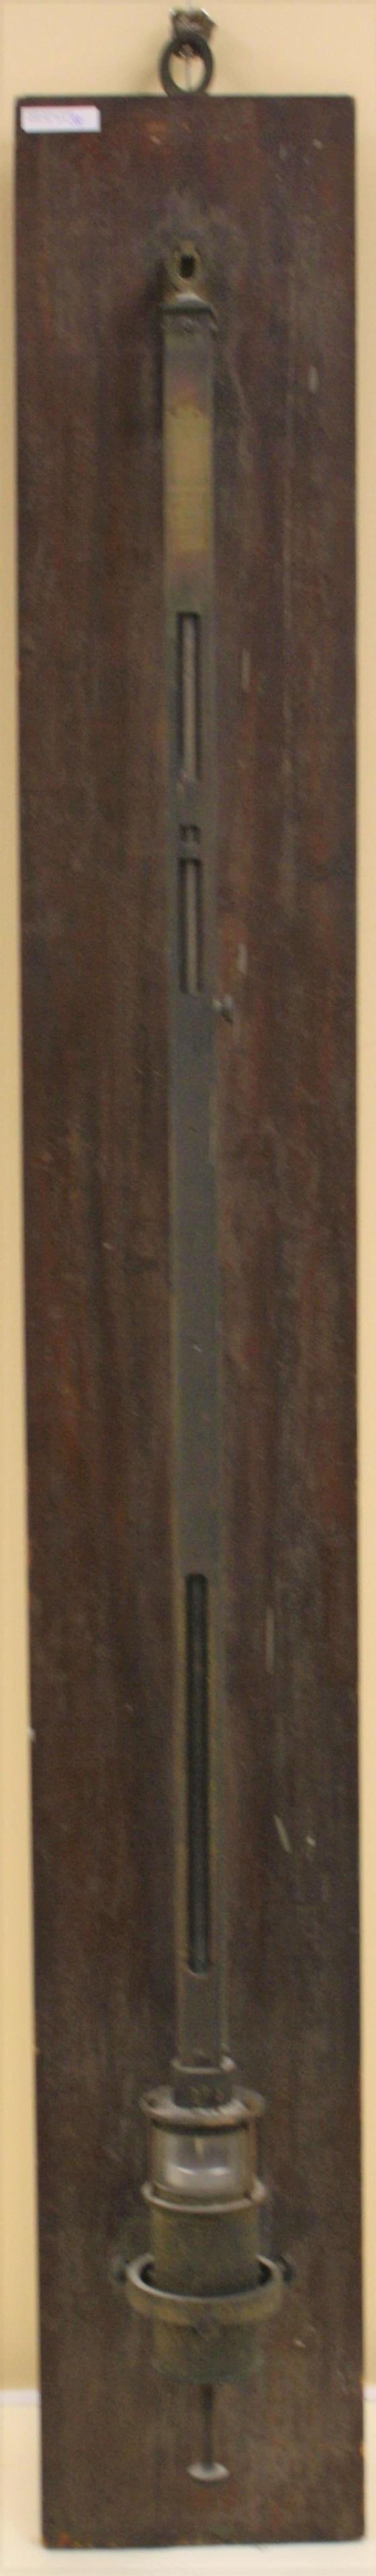 1849 STICK BAROMETER, DUDLEY OBSERVATORY, ALBANY,